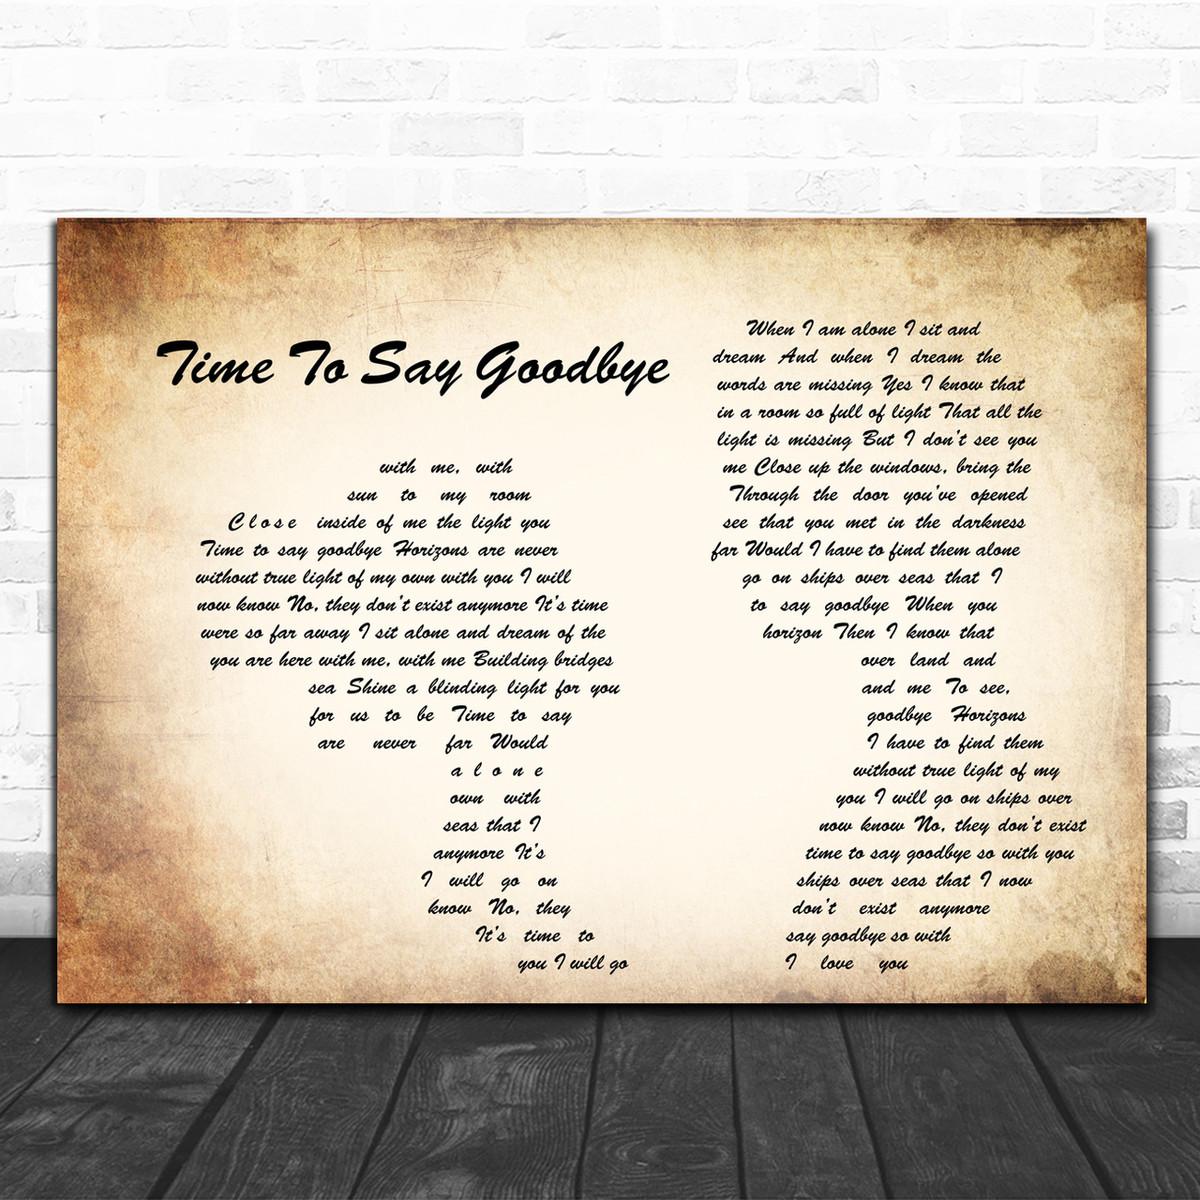 sarah brightman time to say goodbye man lady couple song lyric